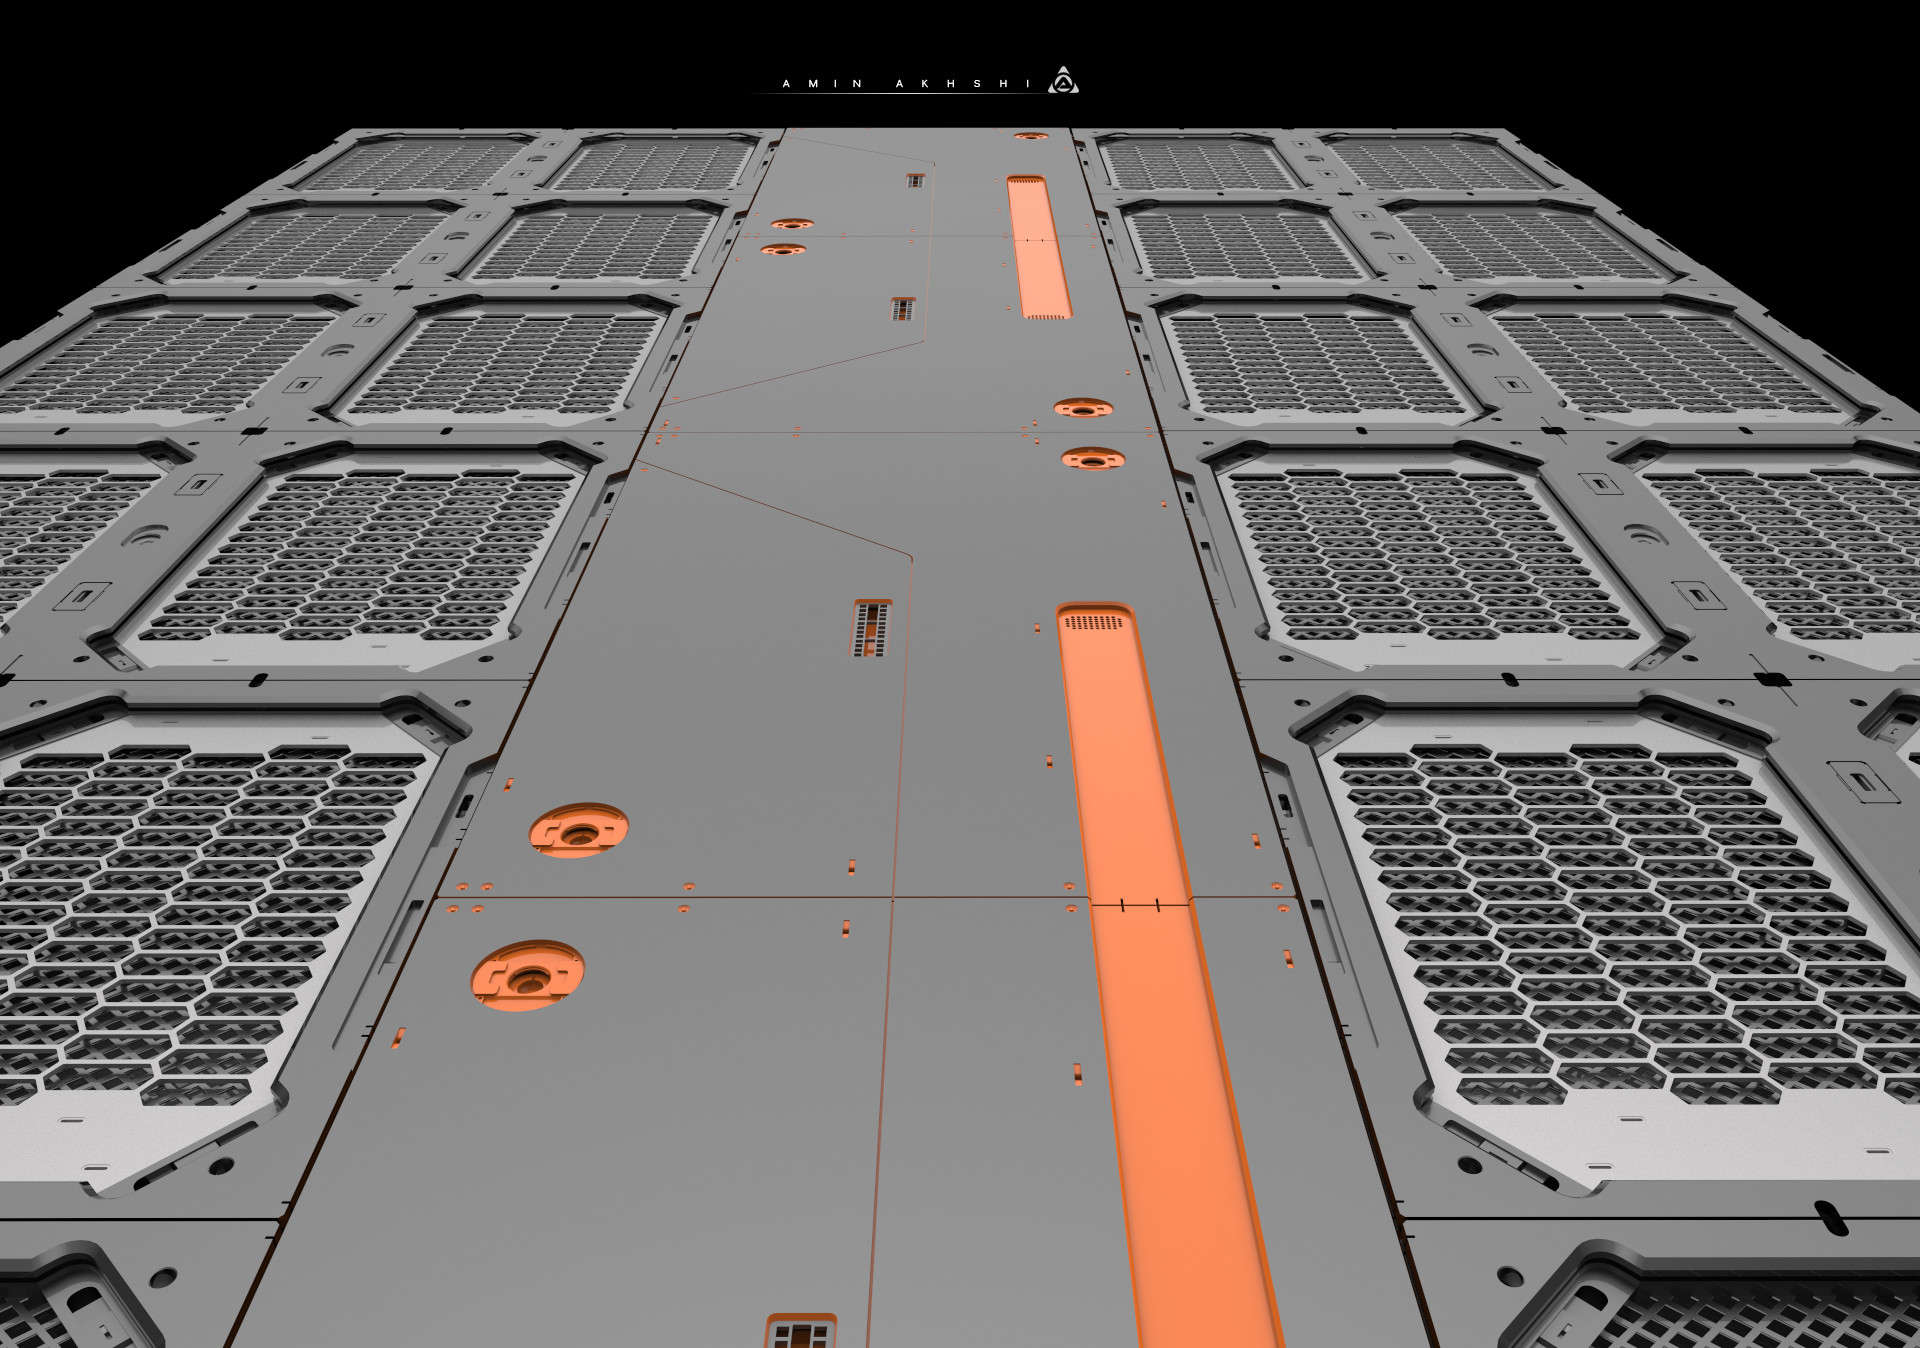 Amin akhshi sci fi floor panels 006